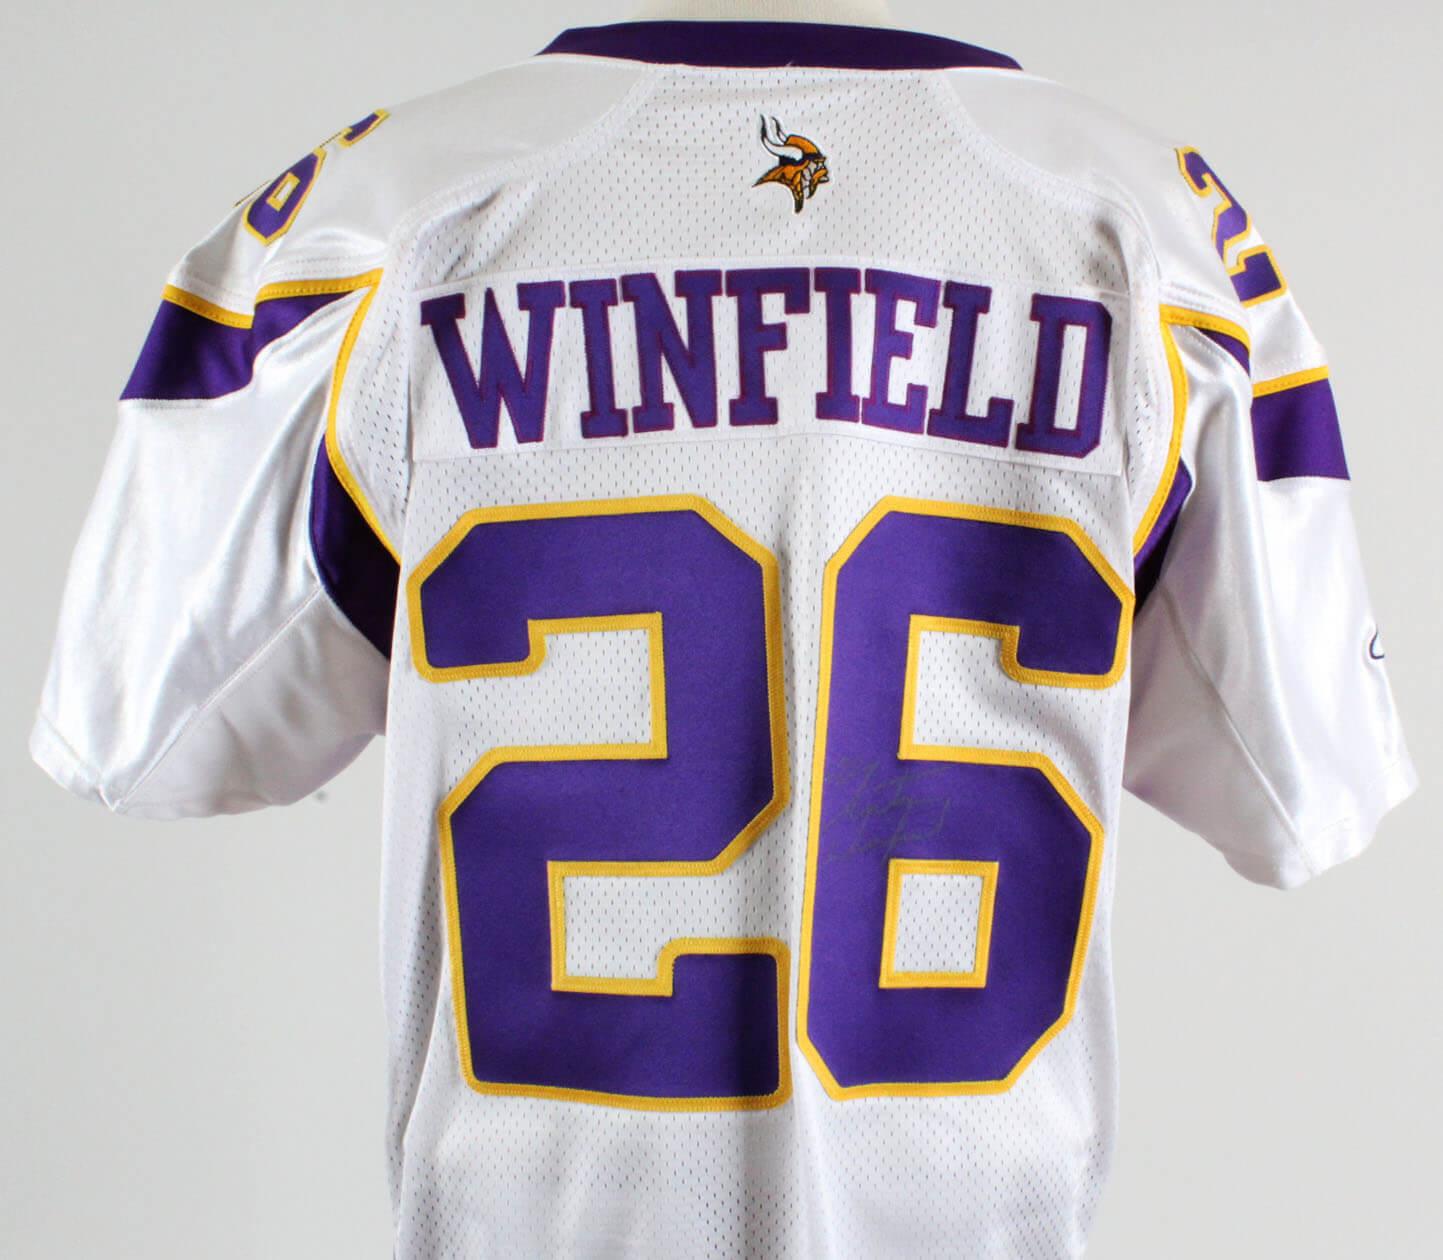 hot sale online 9bde5 9a830 Antoine Winfield Game-Worn Jersey Signed Vikings – COA 100% Team |  Memorabilia Expert